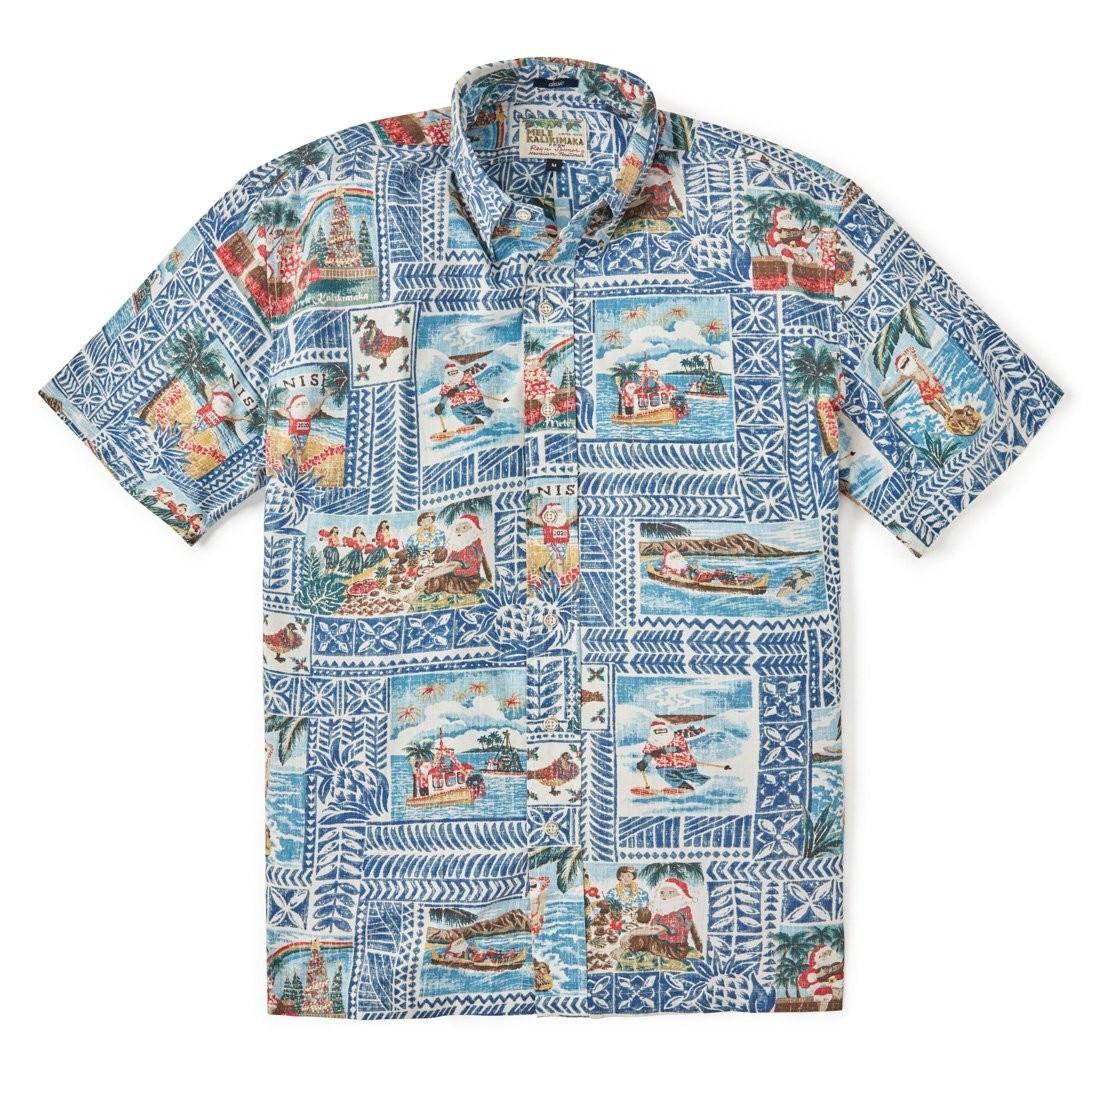 2020 Annual Christmas Shirt